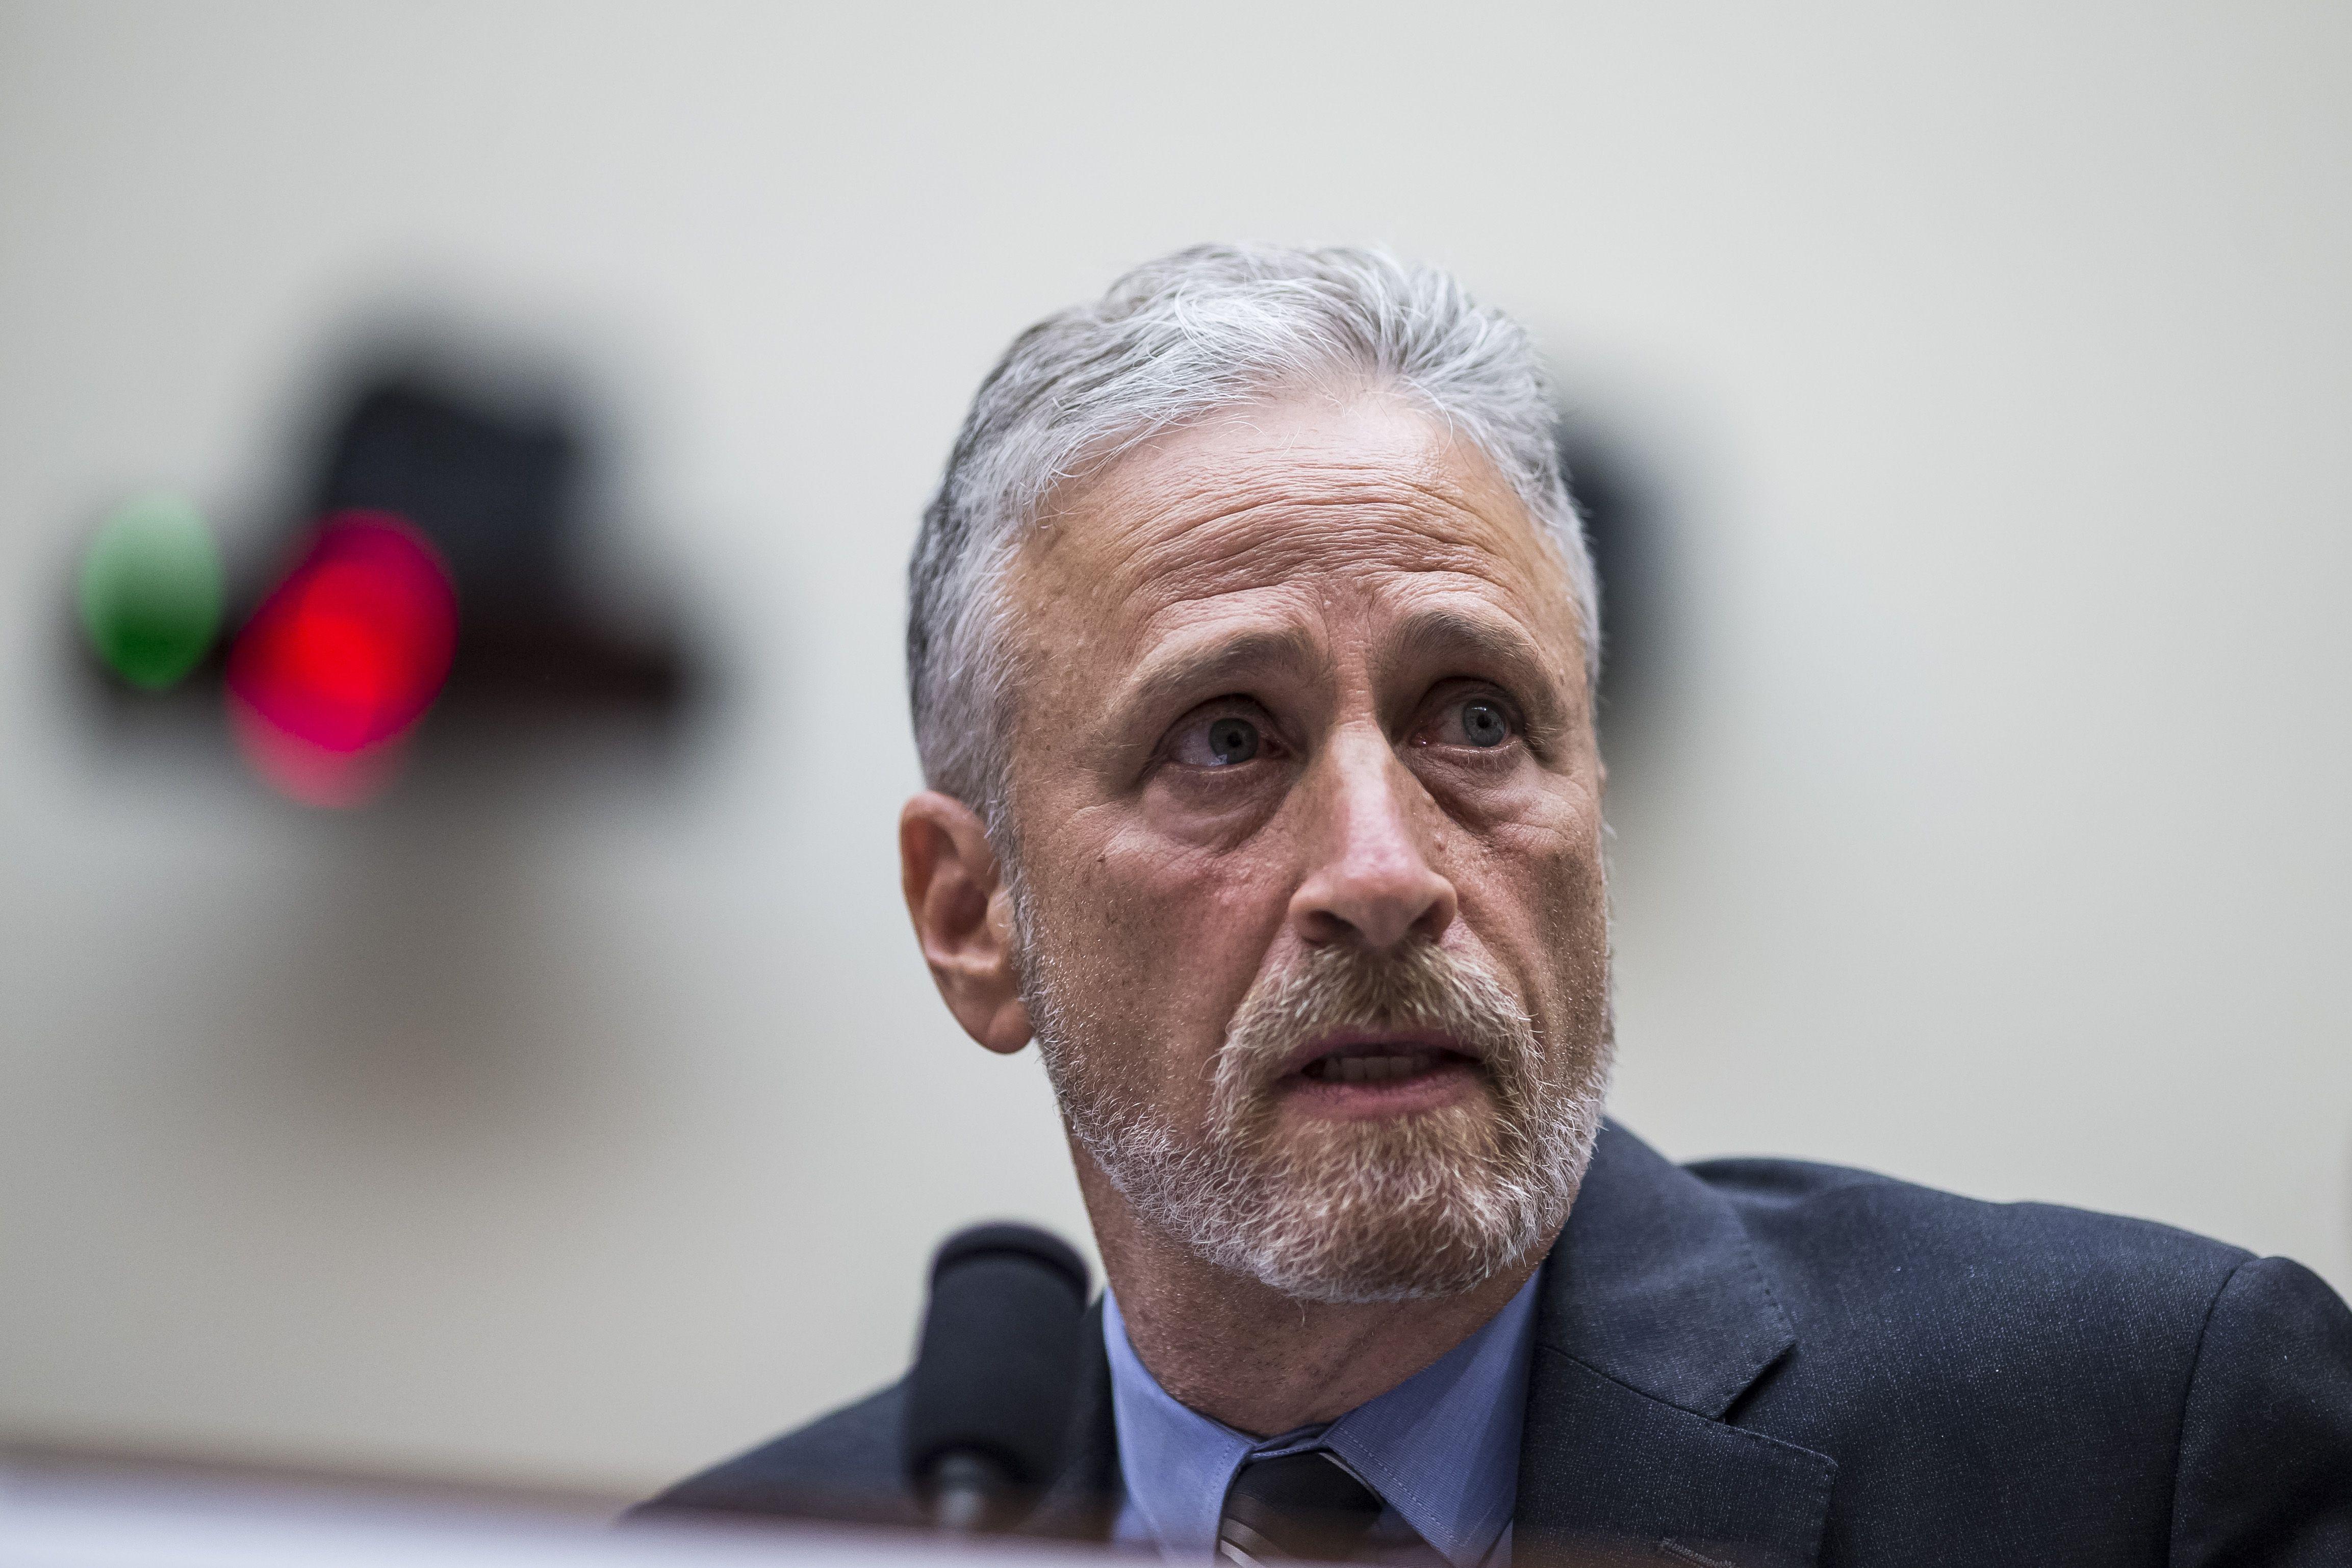 Jon Stewart: Rand Paul blocking 9/11 Victim Fund bill is an abomination - Axios